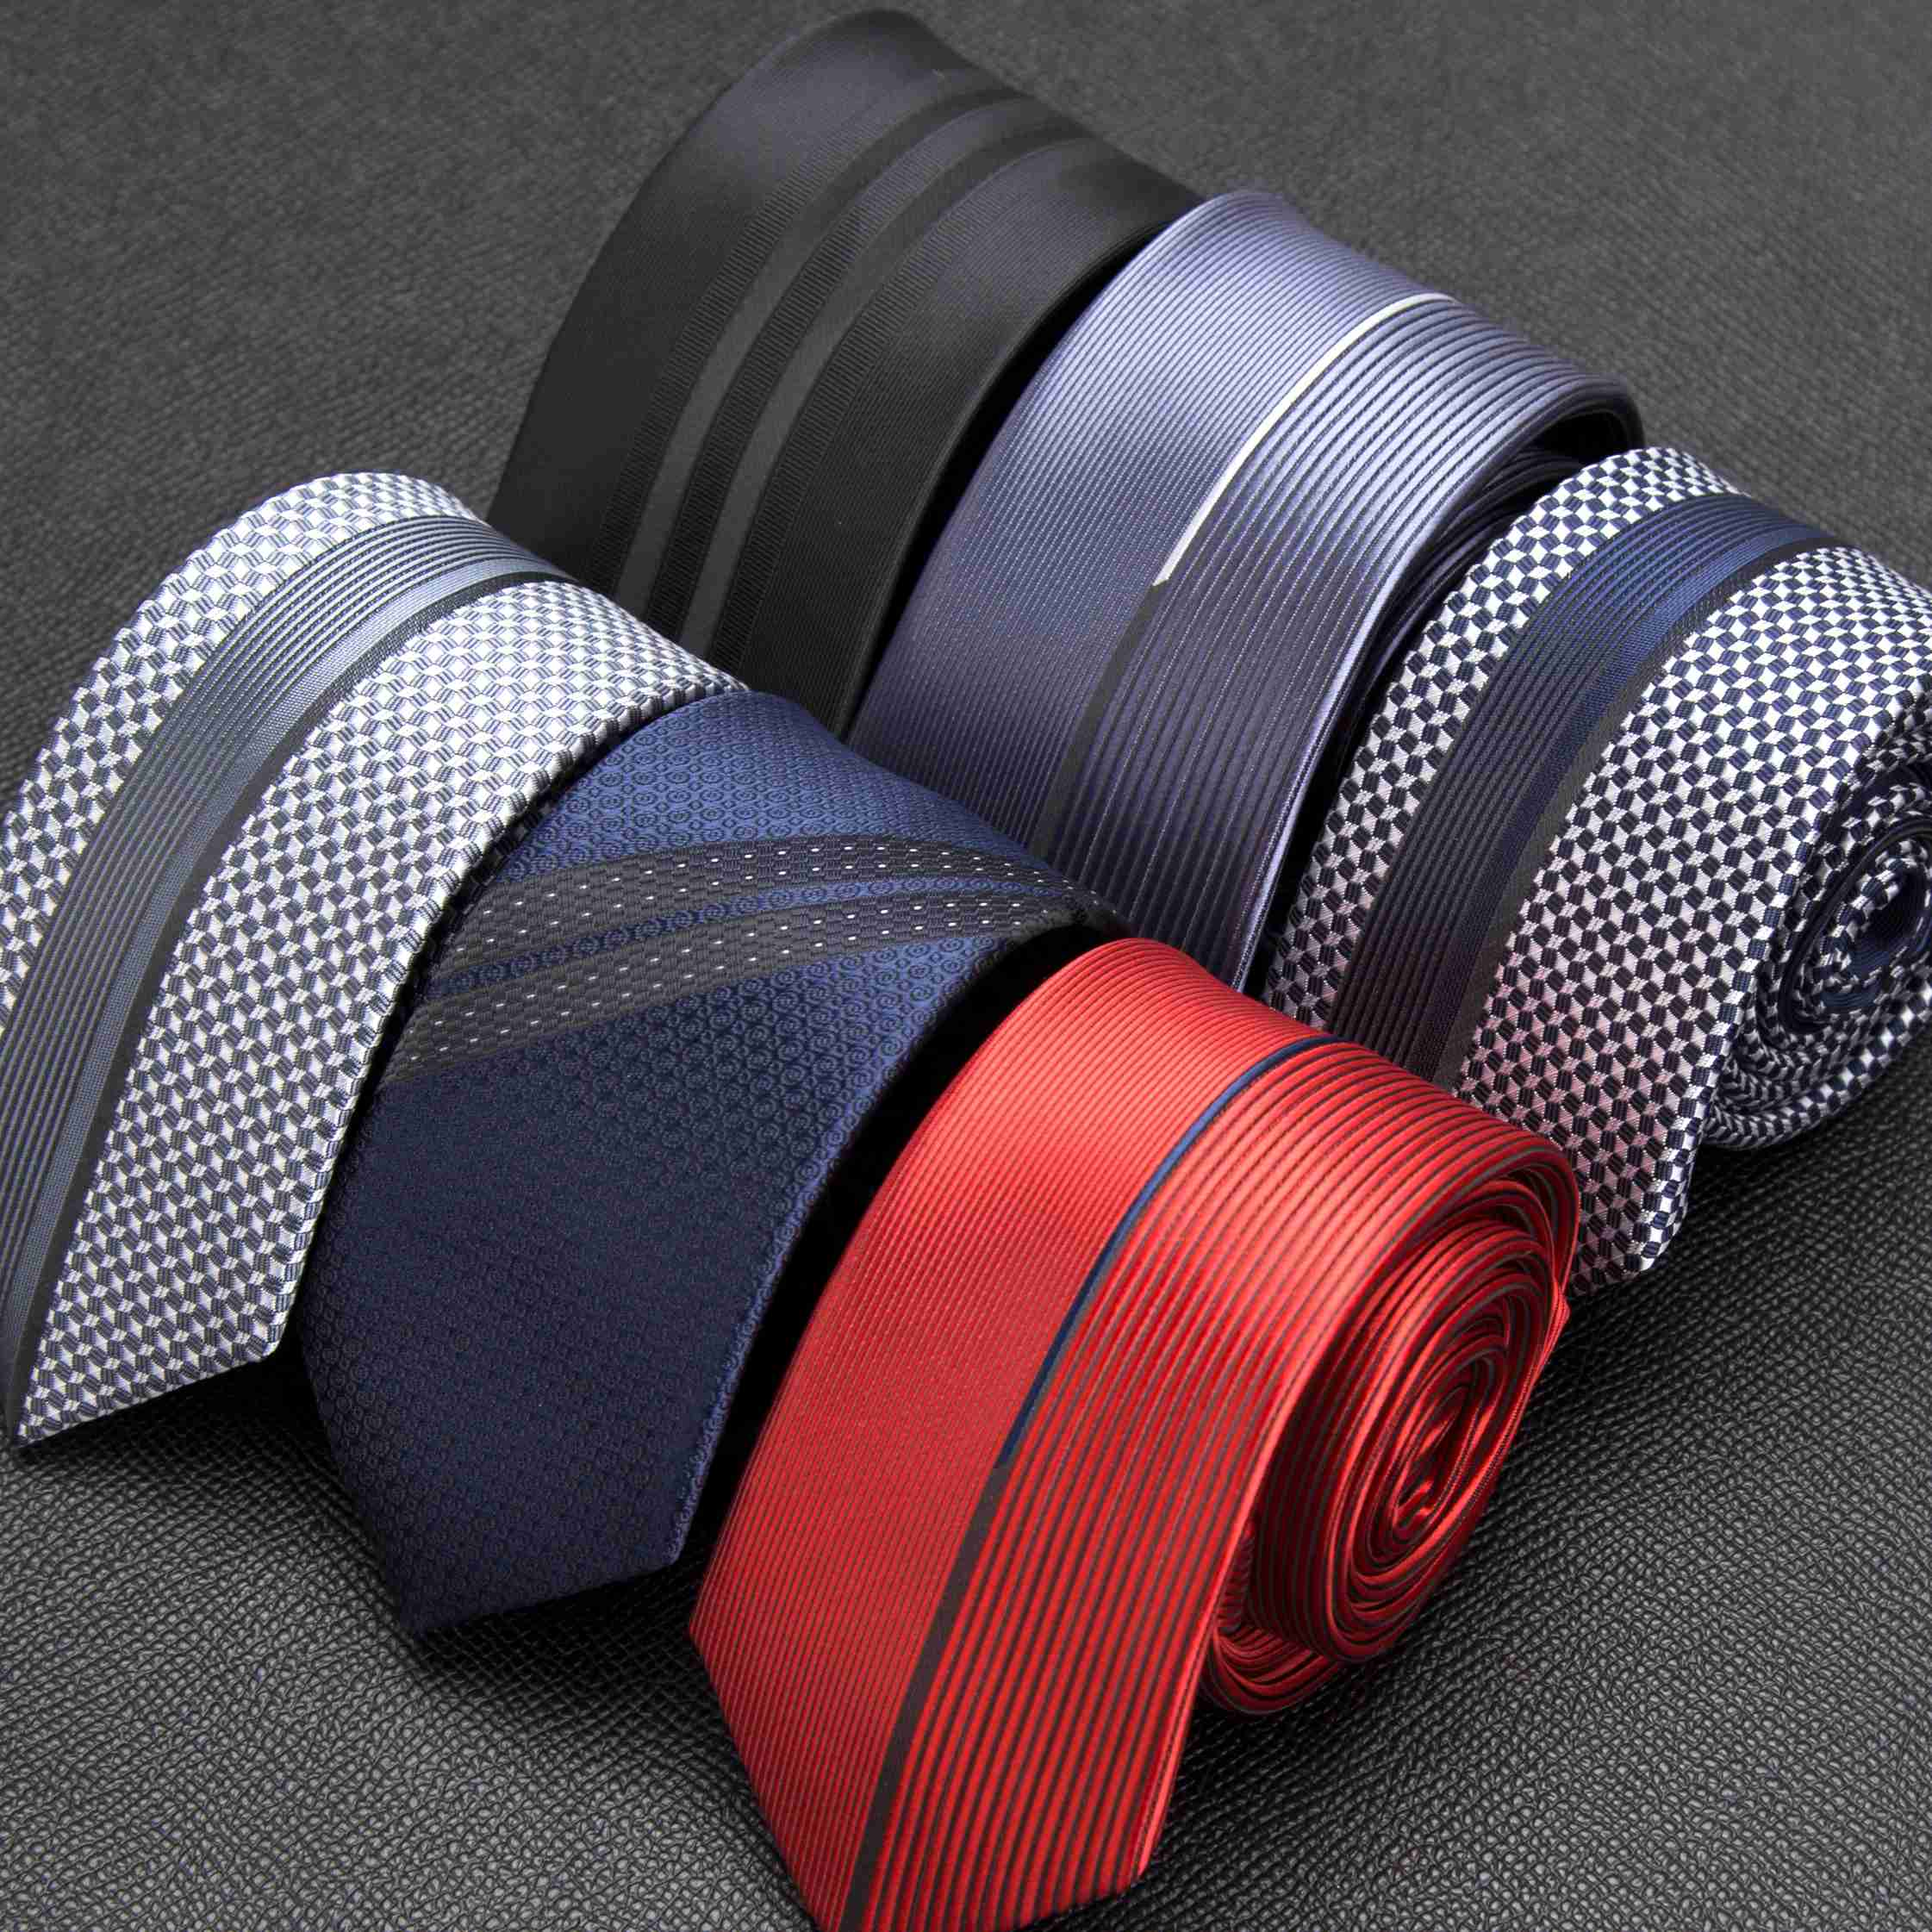 Men Tie Classic Luxurious Slim Stripe Ties For Mens Business Wedding Jacquard Necktie Male Dress Shirt Bowtie Gift Accessories